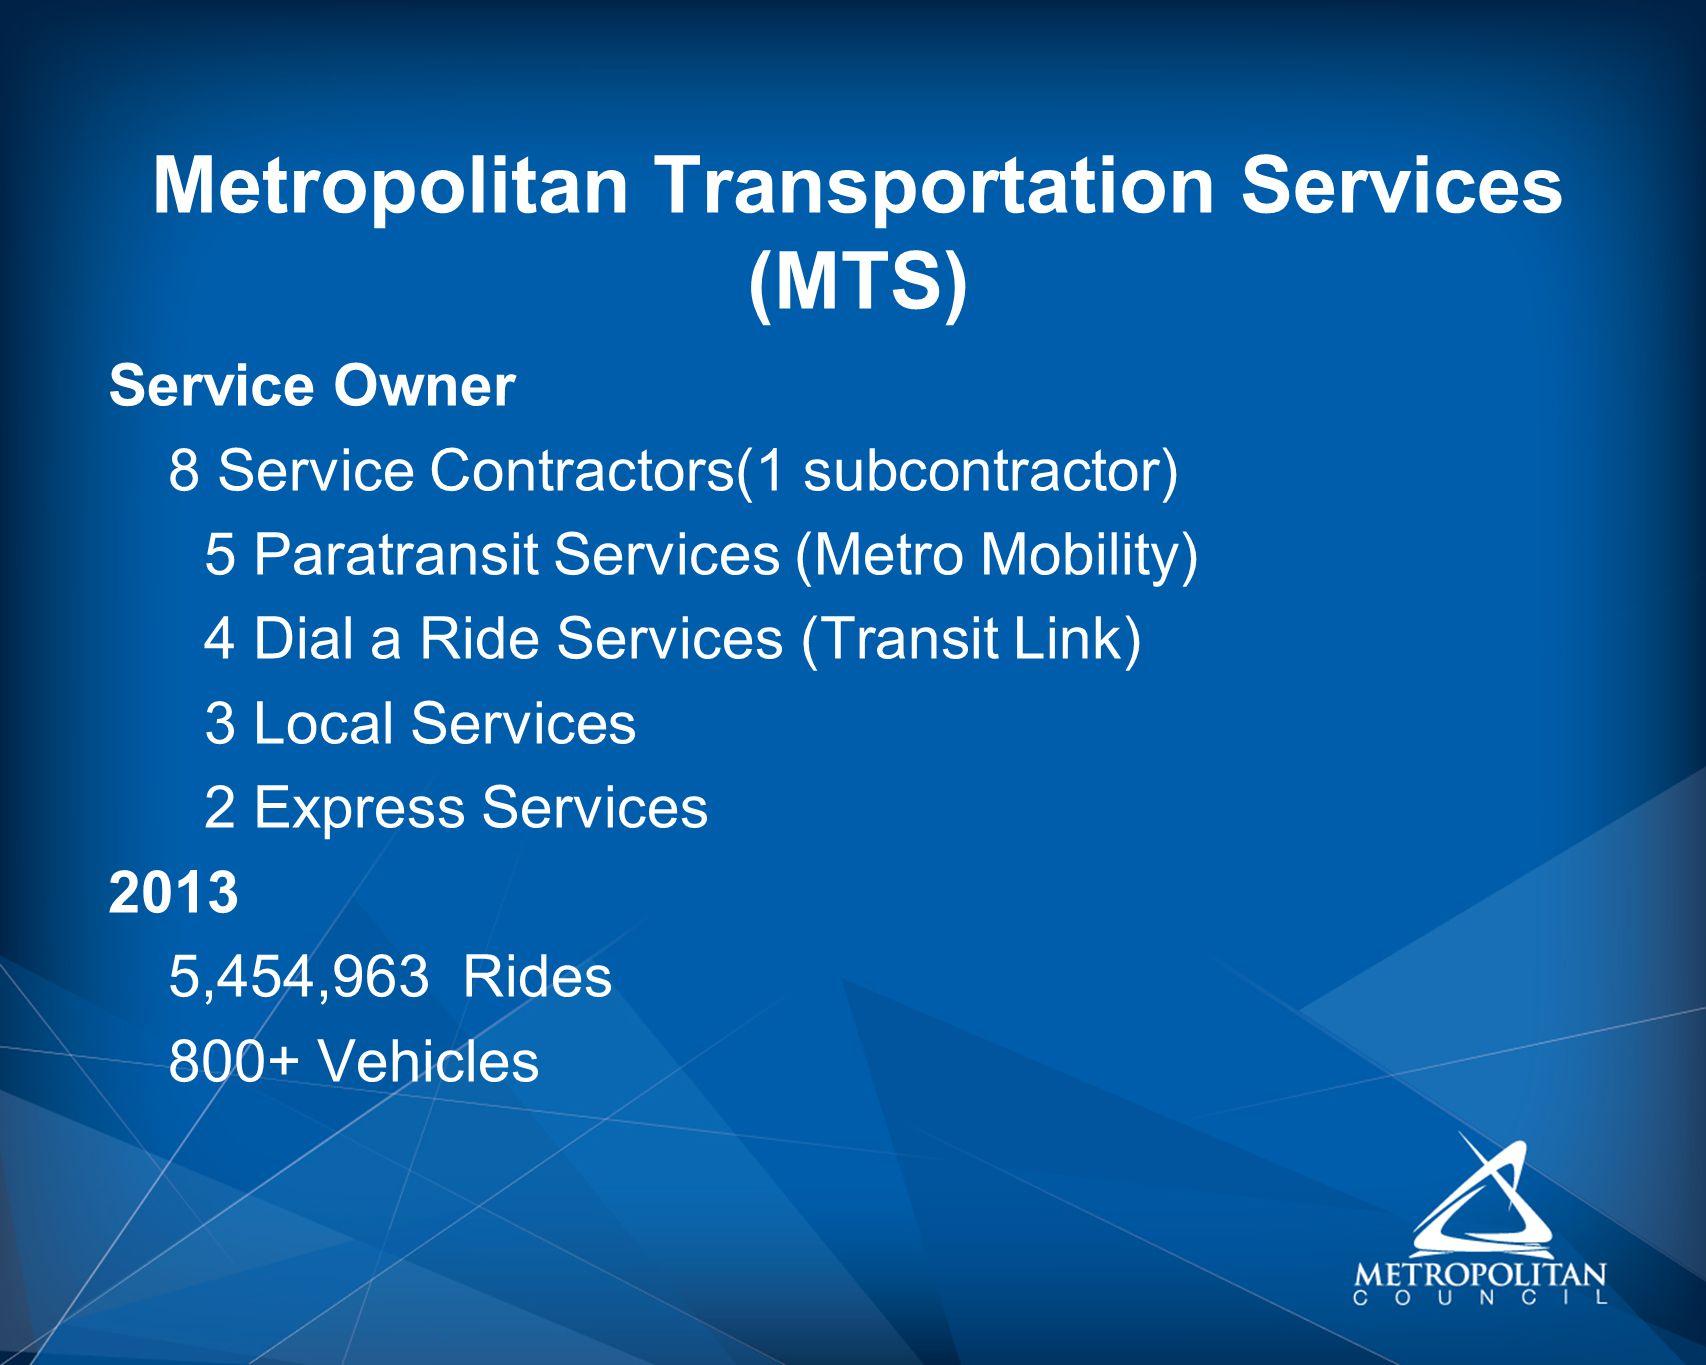 Service Owner 8 Service Contractors(1 subcontractor) 5 Paratransit Services (Metro Mobility) 4 Dial a Ride Services (Transit Link) 3 Local Services 2